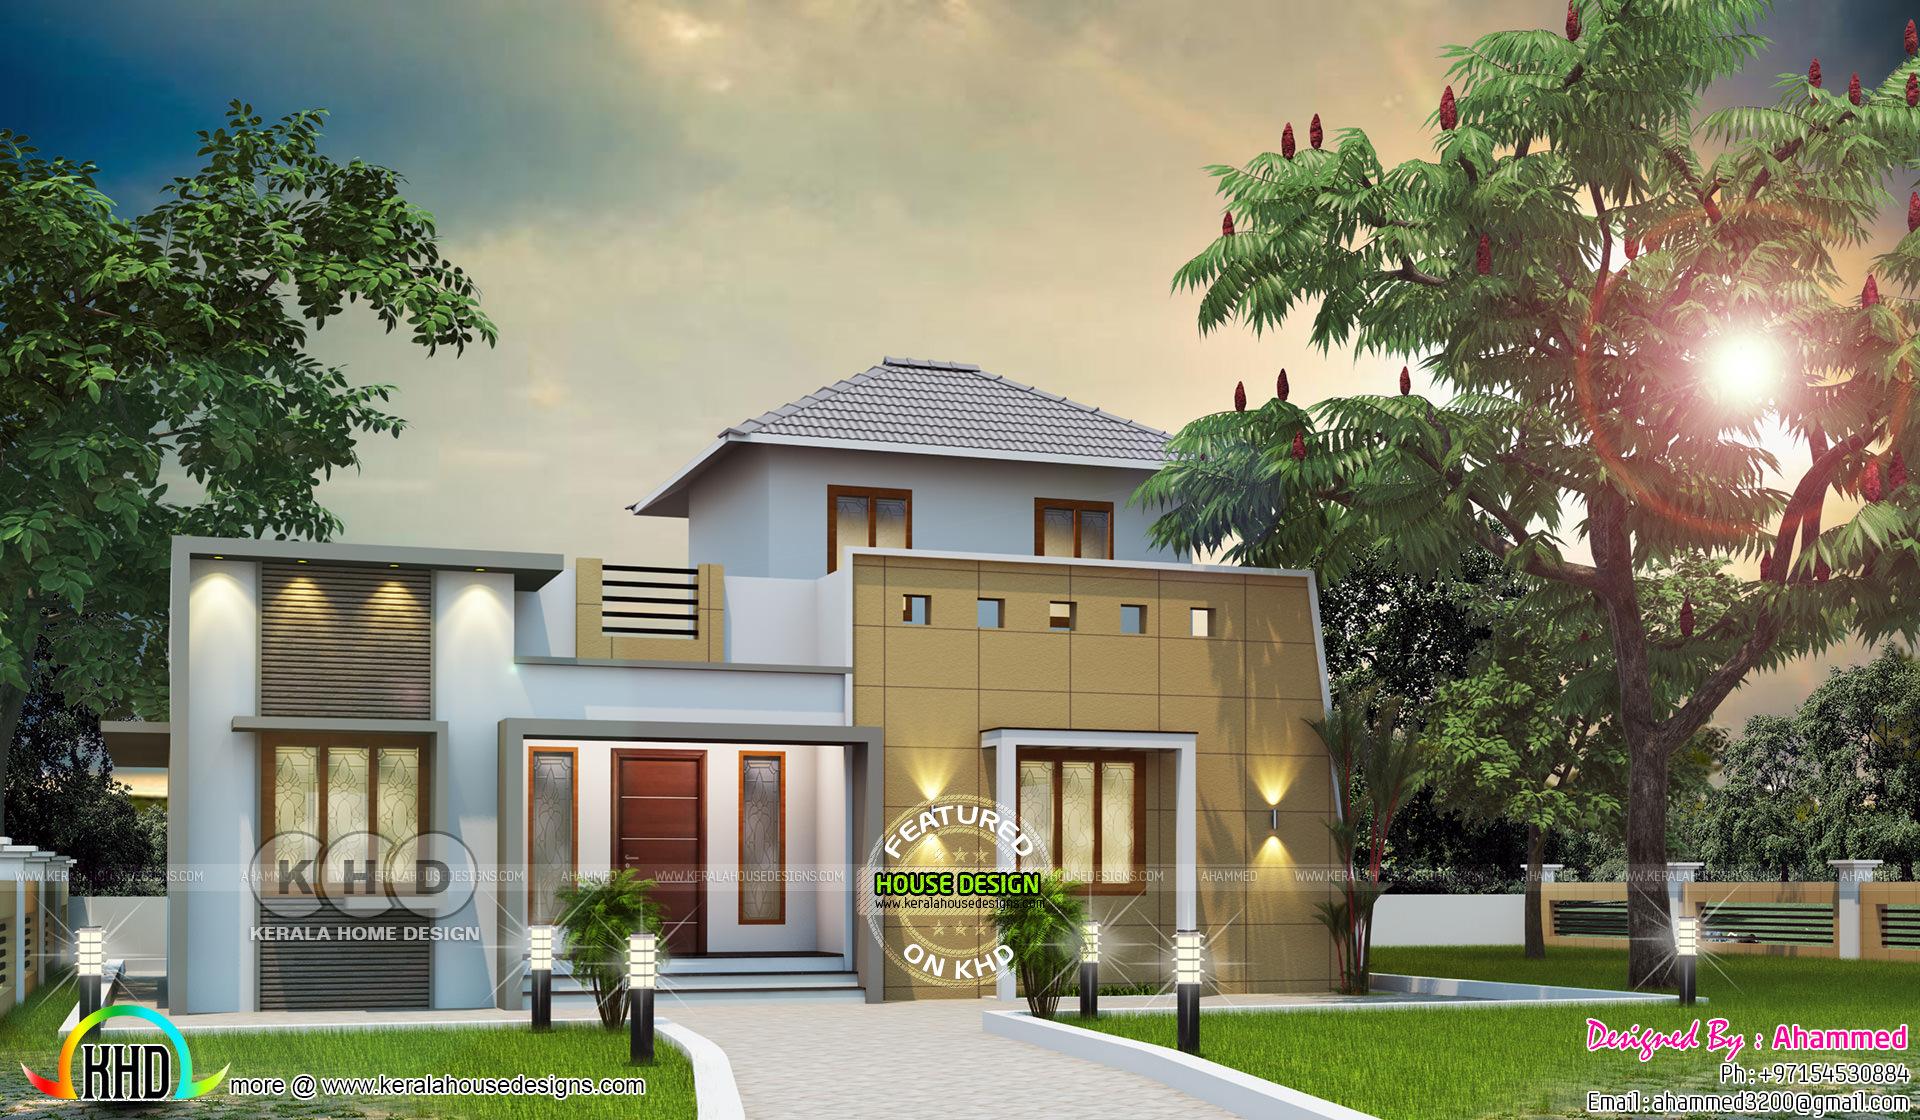 5 bedroom modern house in 1430 square feet | Kerala home ...